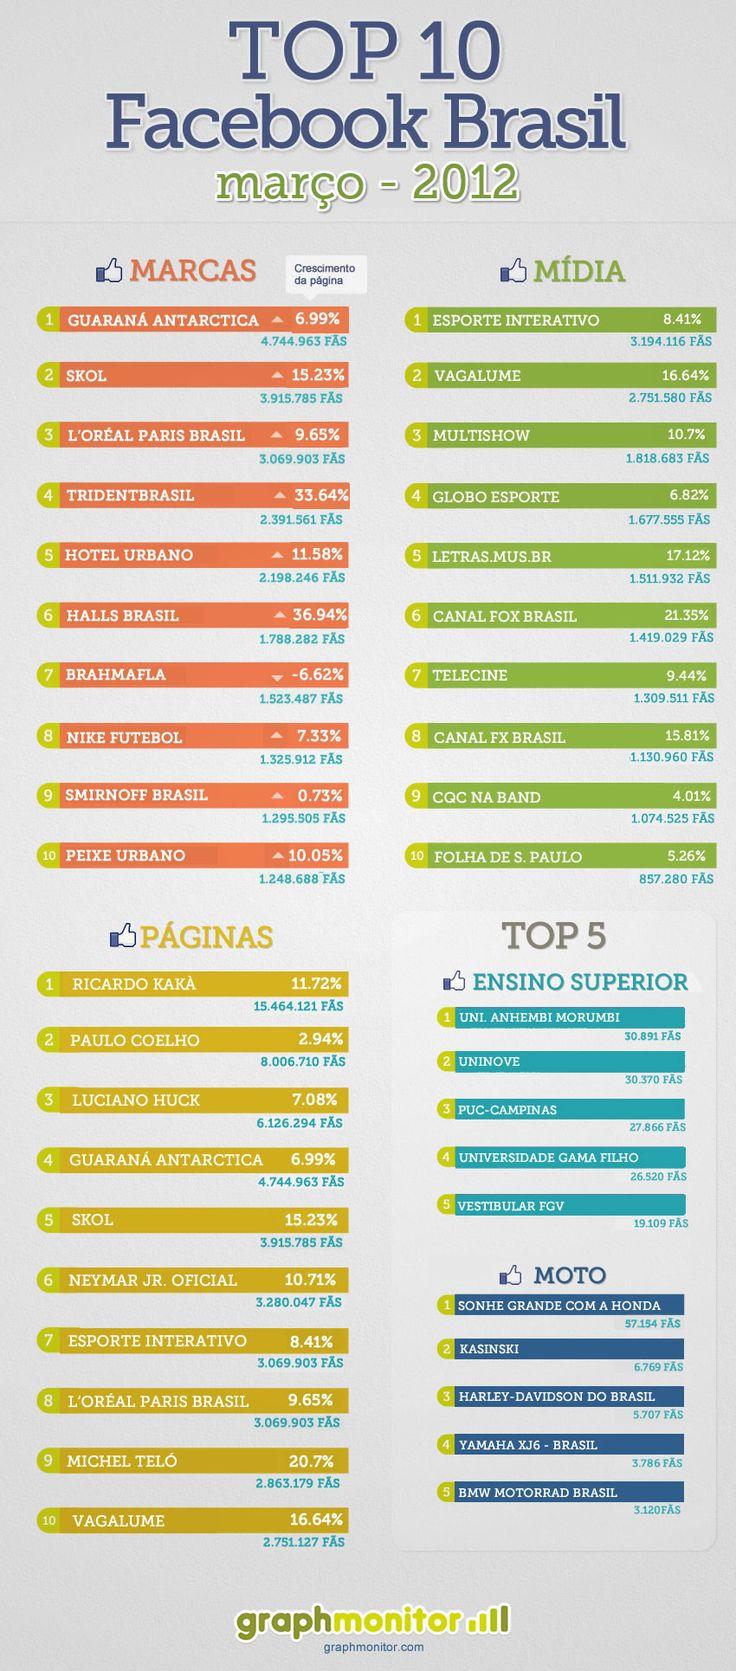 Infográfico TOP 10 Facebook Brasil 2012